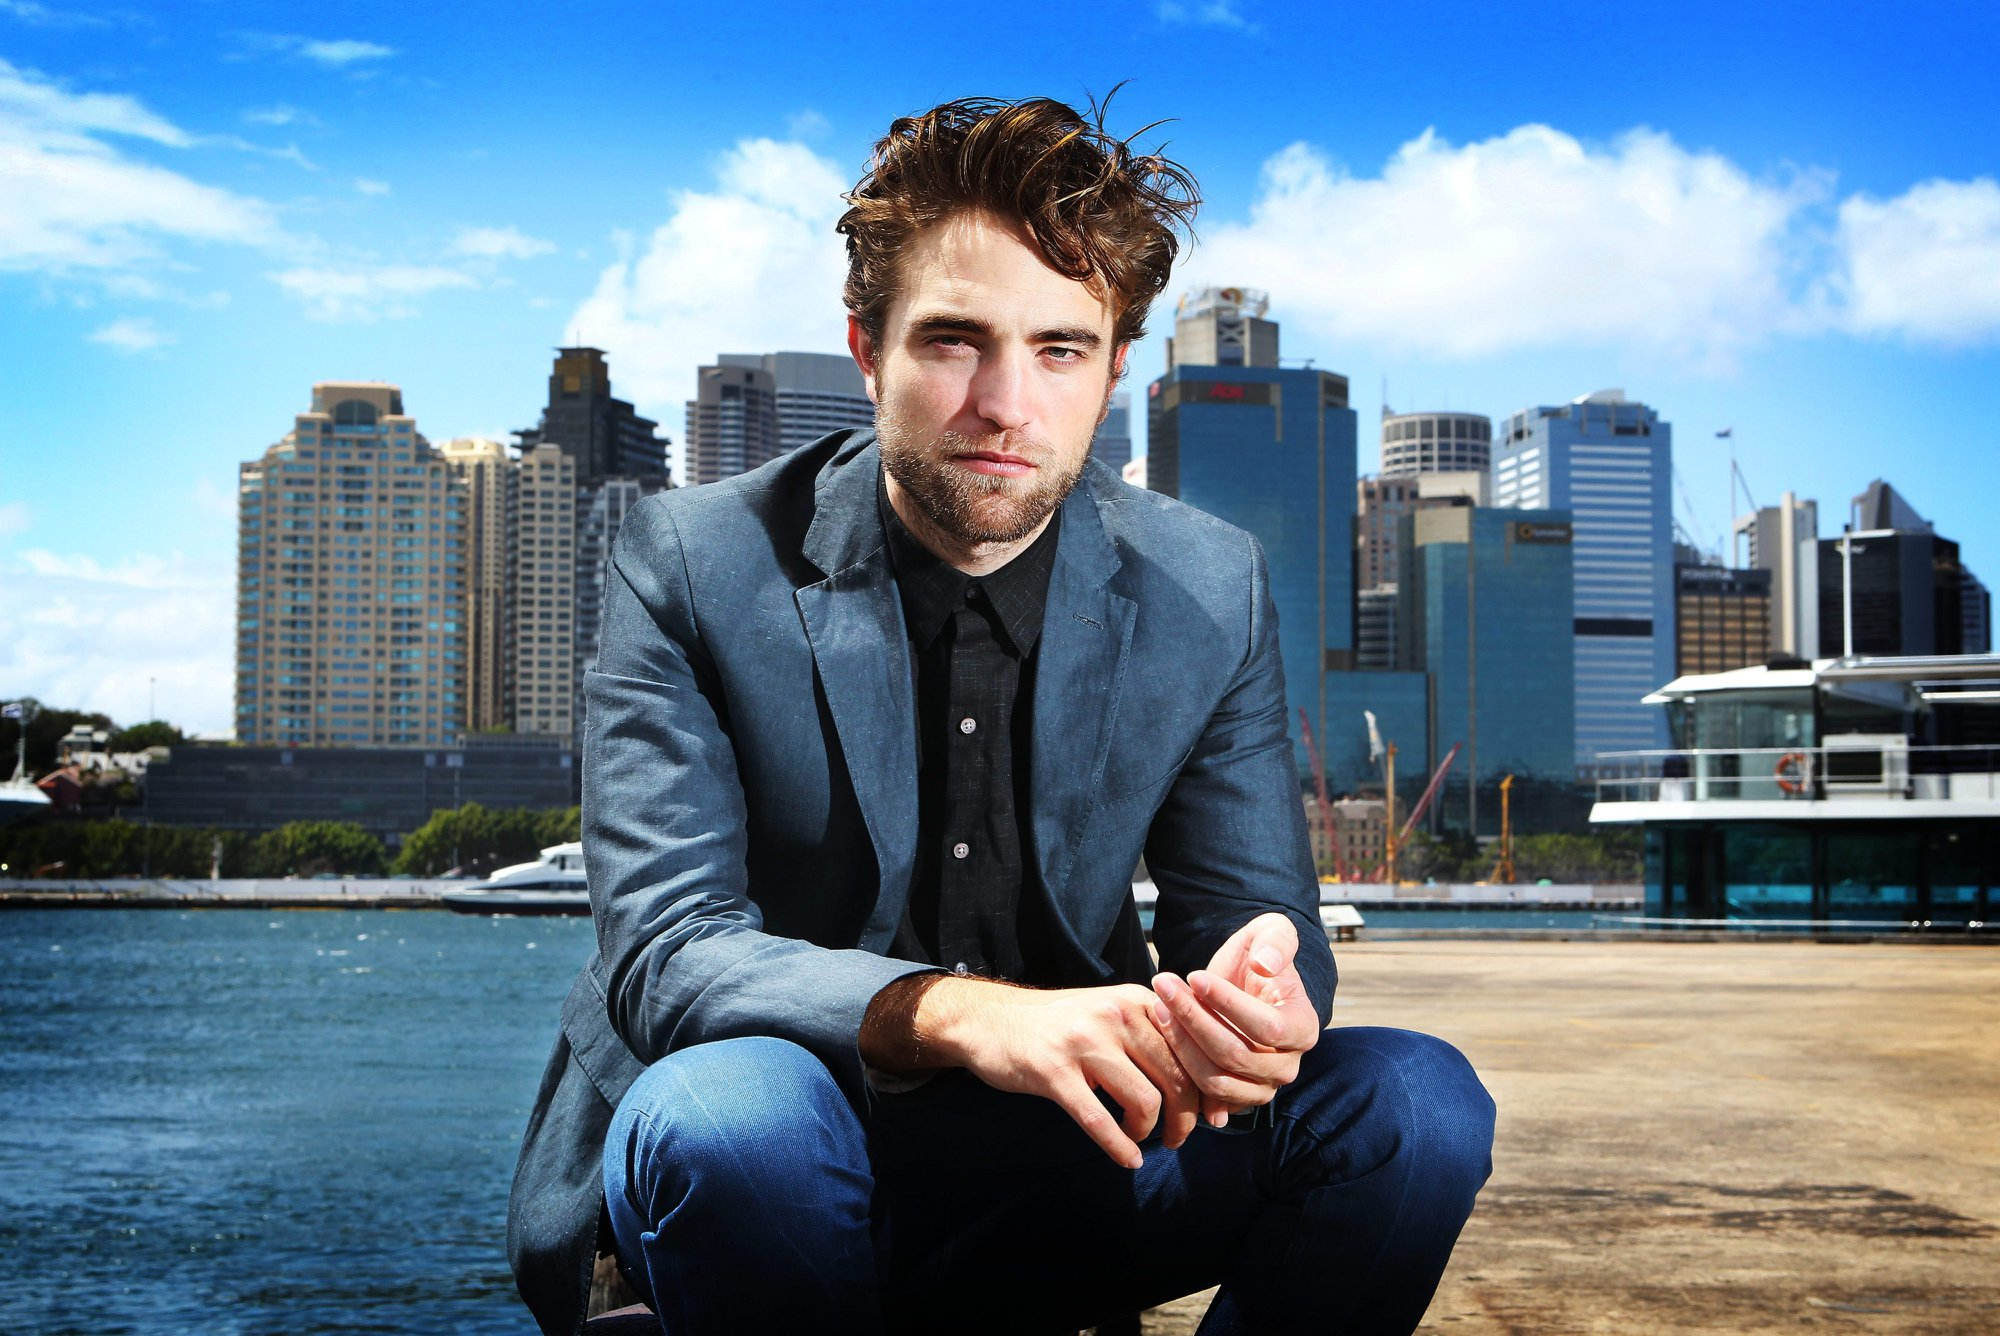 Robert Pattinson New Haircut 2019